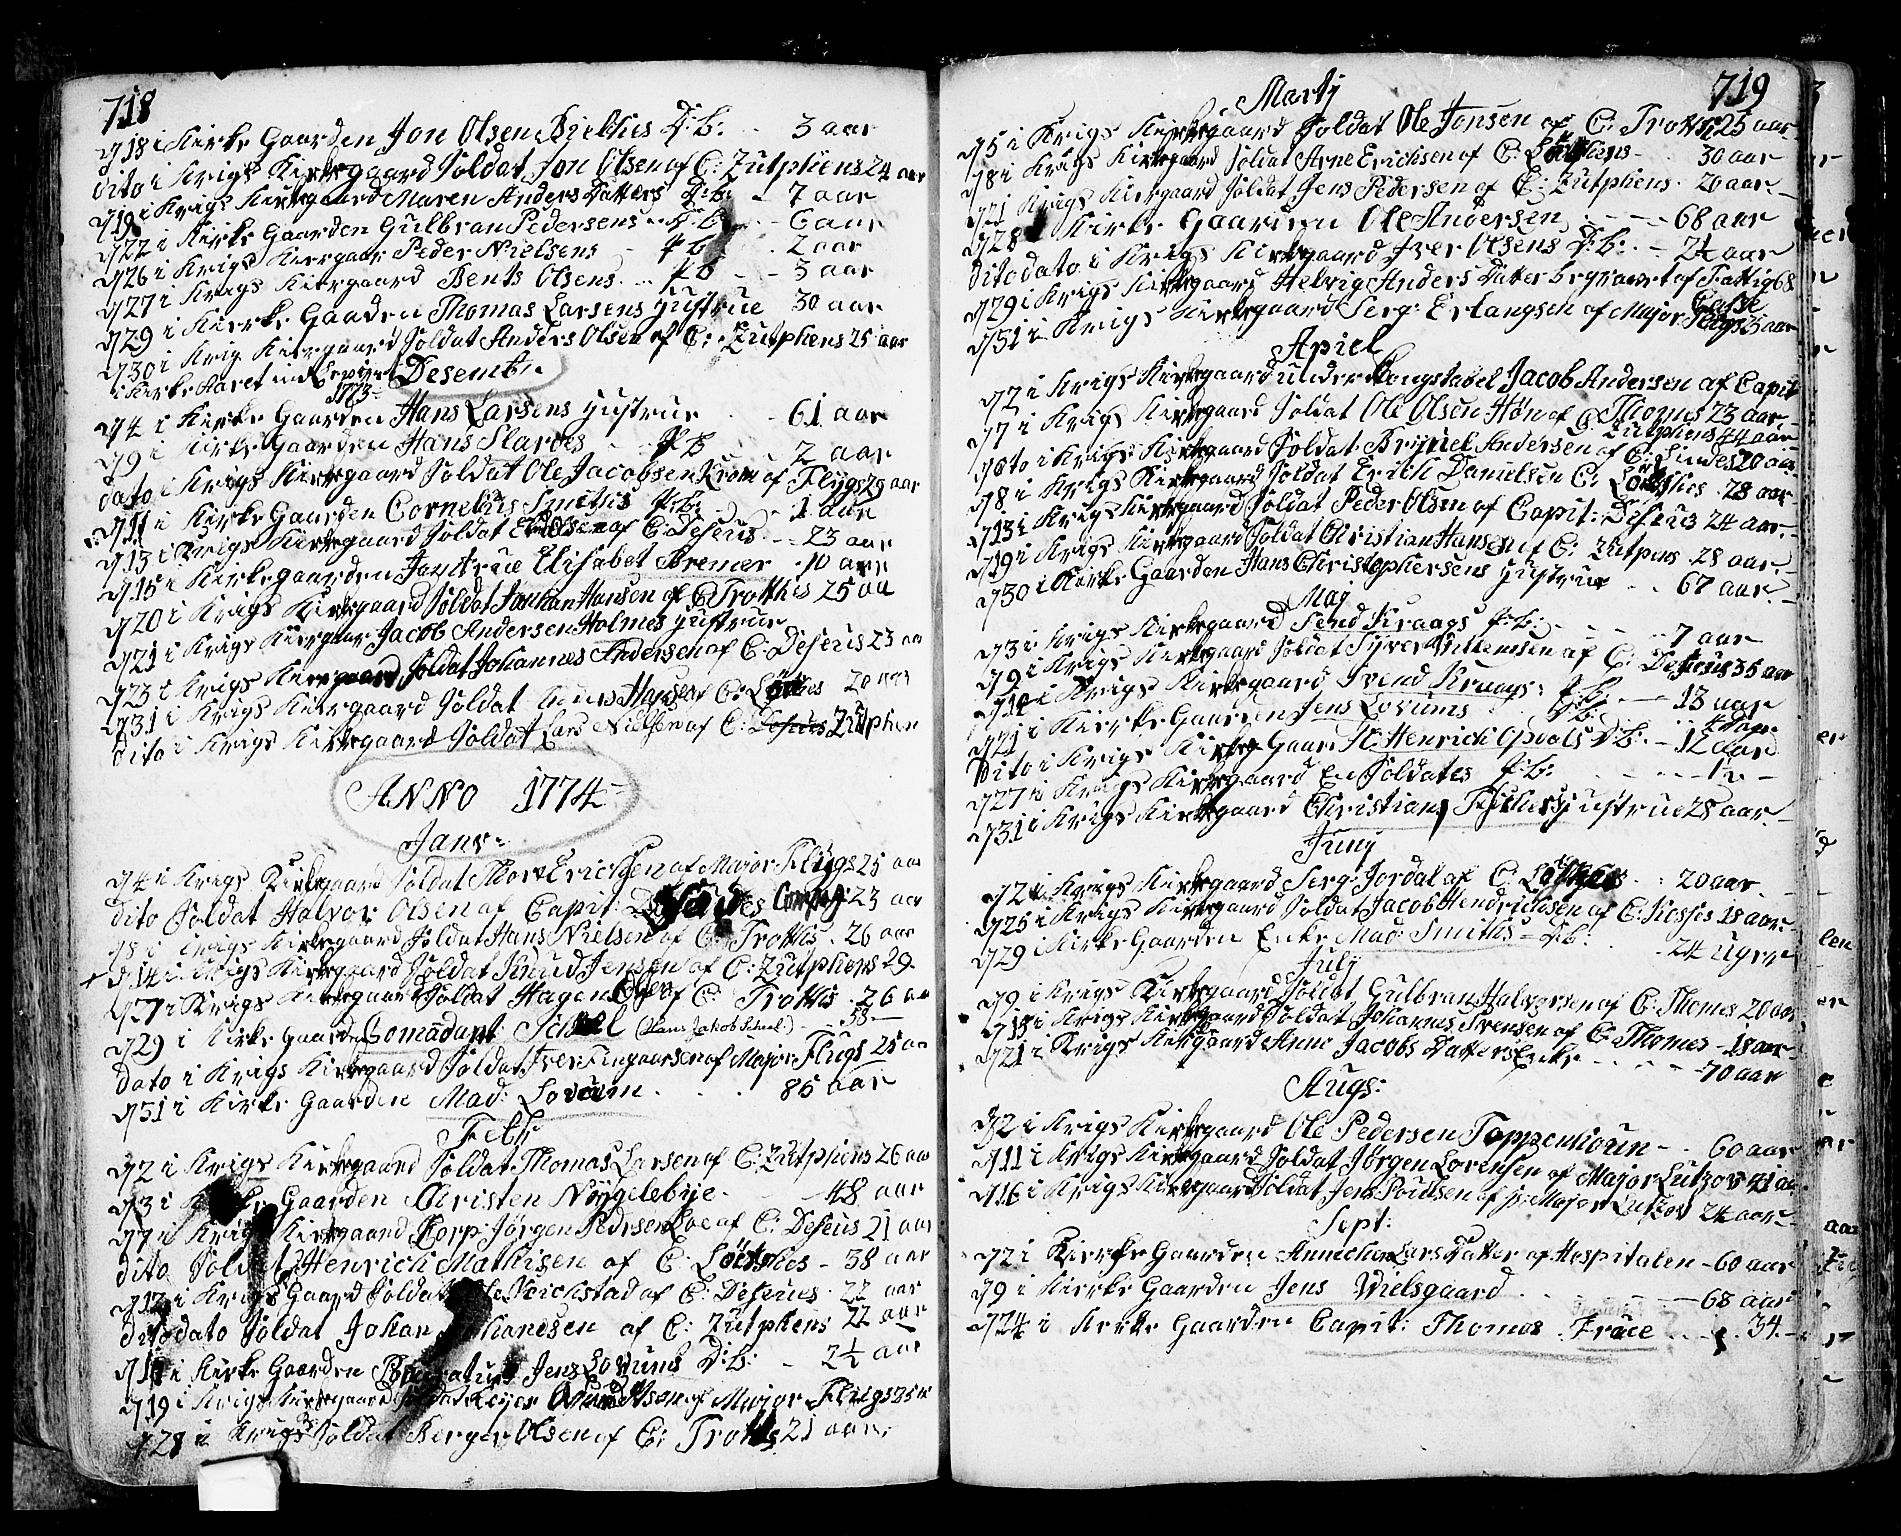 SAO, Fredrikstad prestekontor Kirkebøker, F/Fa/L0002: Ministerialbok nr. 2, 1750-1804, s. 718-719